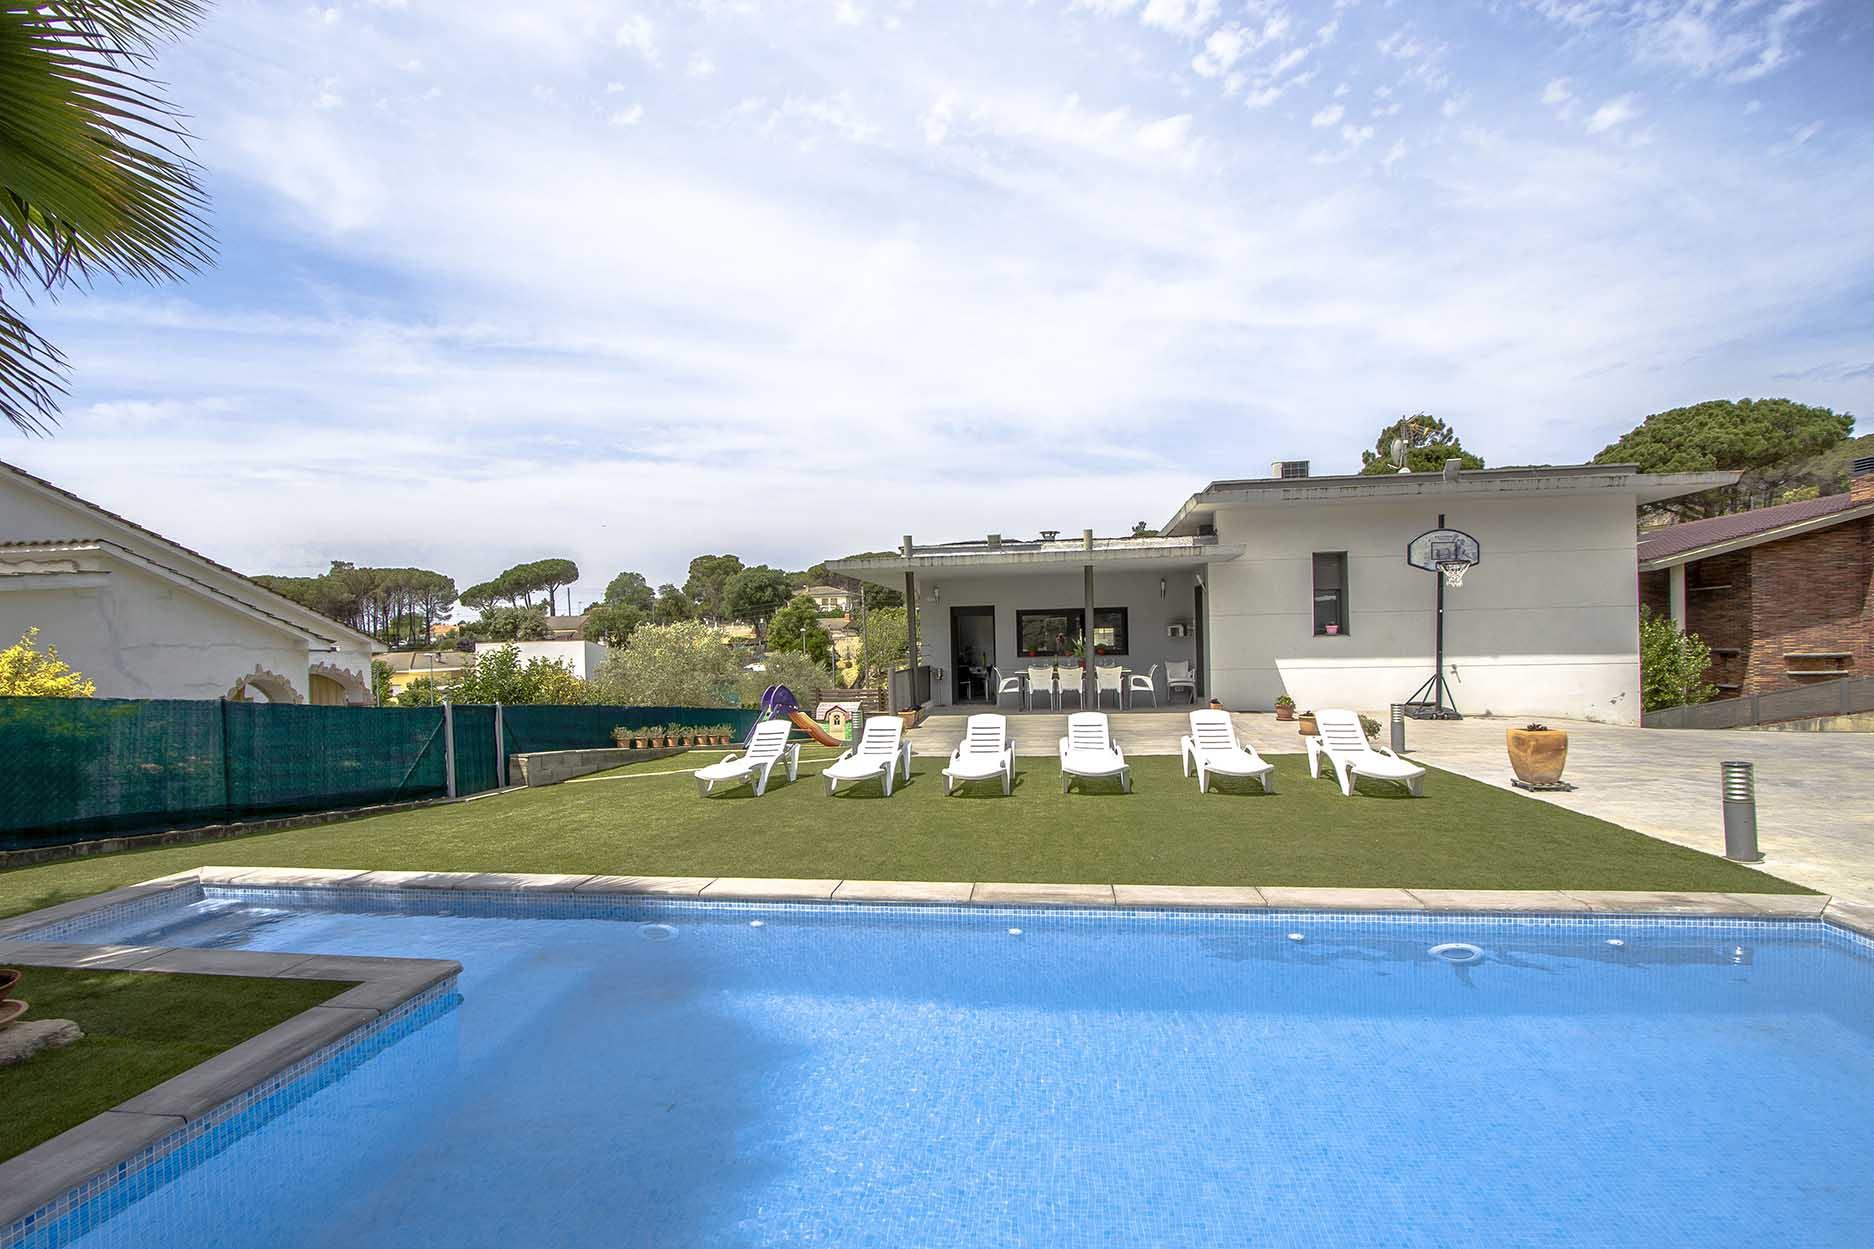 Ferienhaus Catalunya Casas: Modern villa in Sils, 15 min drive to Costa Brava beaches! (1902227), Les Mallorquines, Girona, Katalonien, Spanien, Bild 3